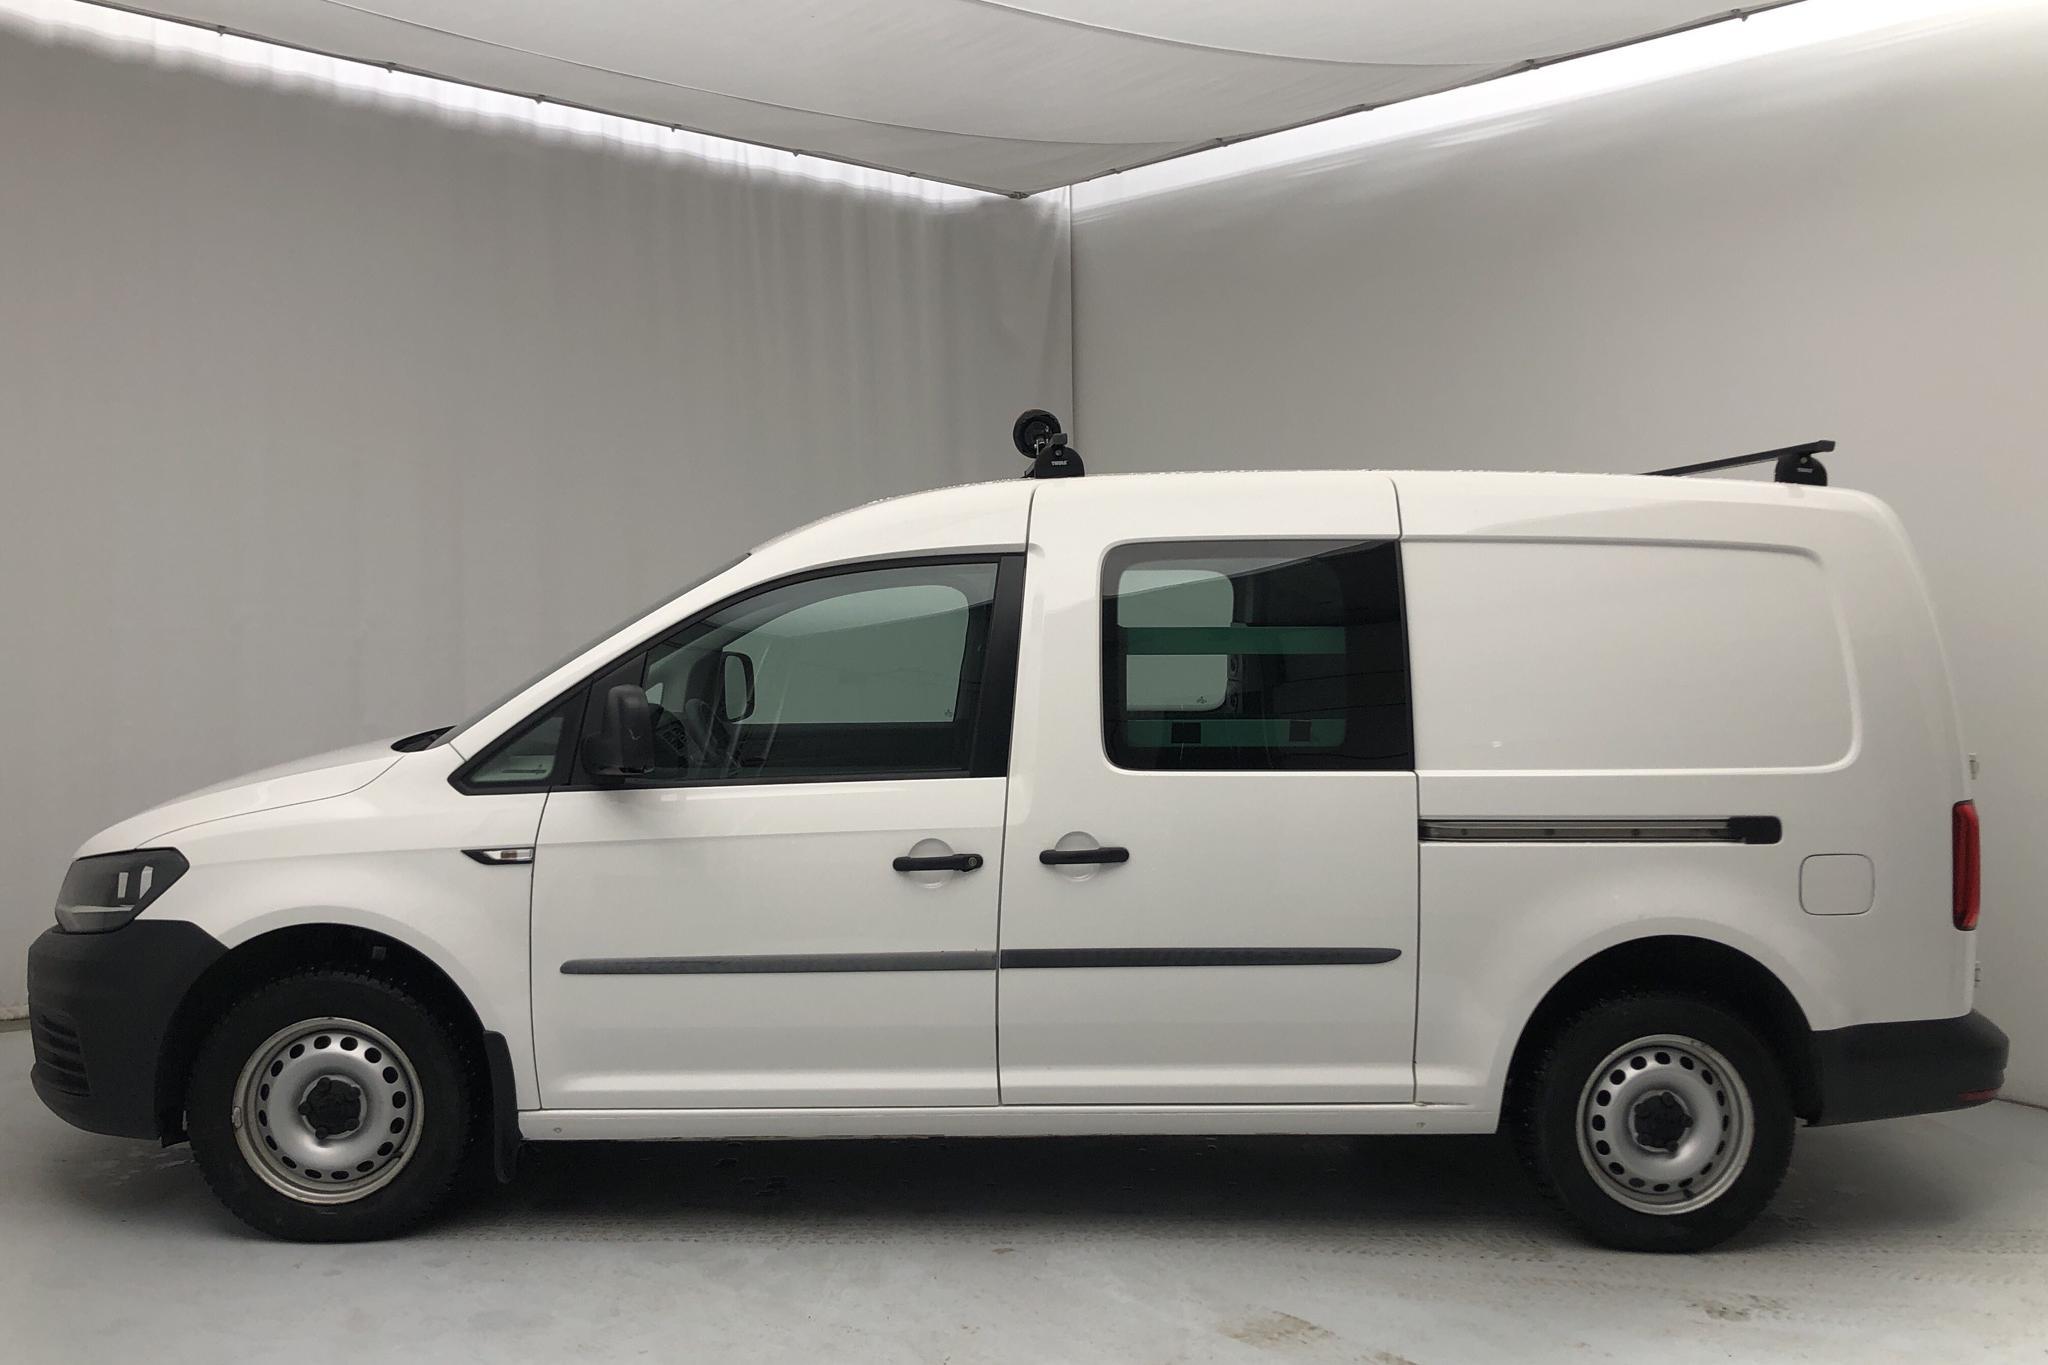 VW Caddy Maxi 1.4 TGI (110hk) - 25 600 km - Automatic - white - 2017